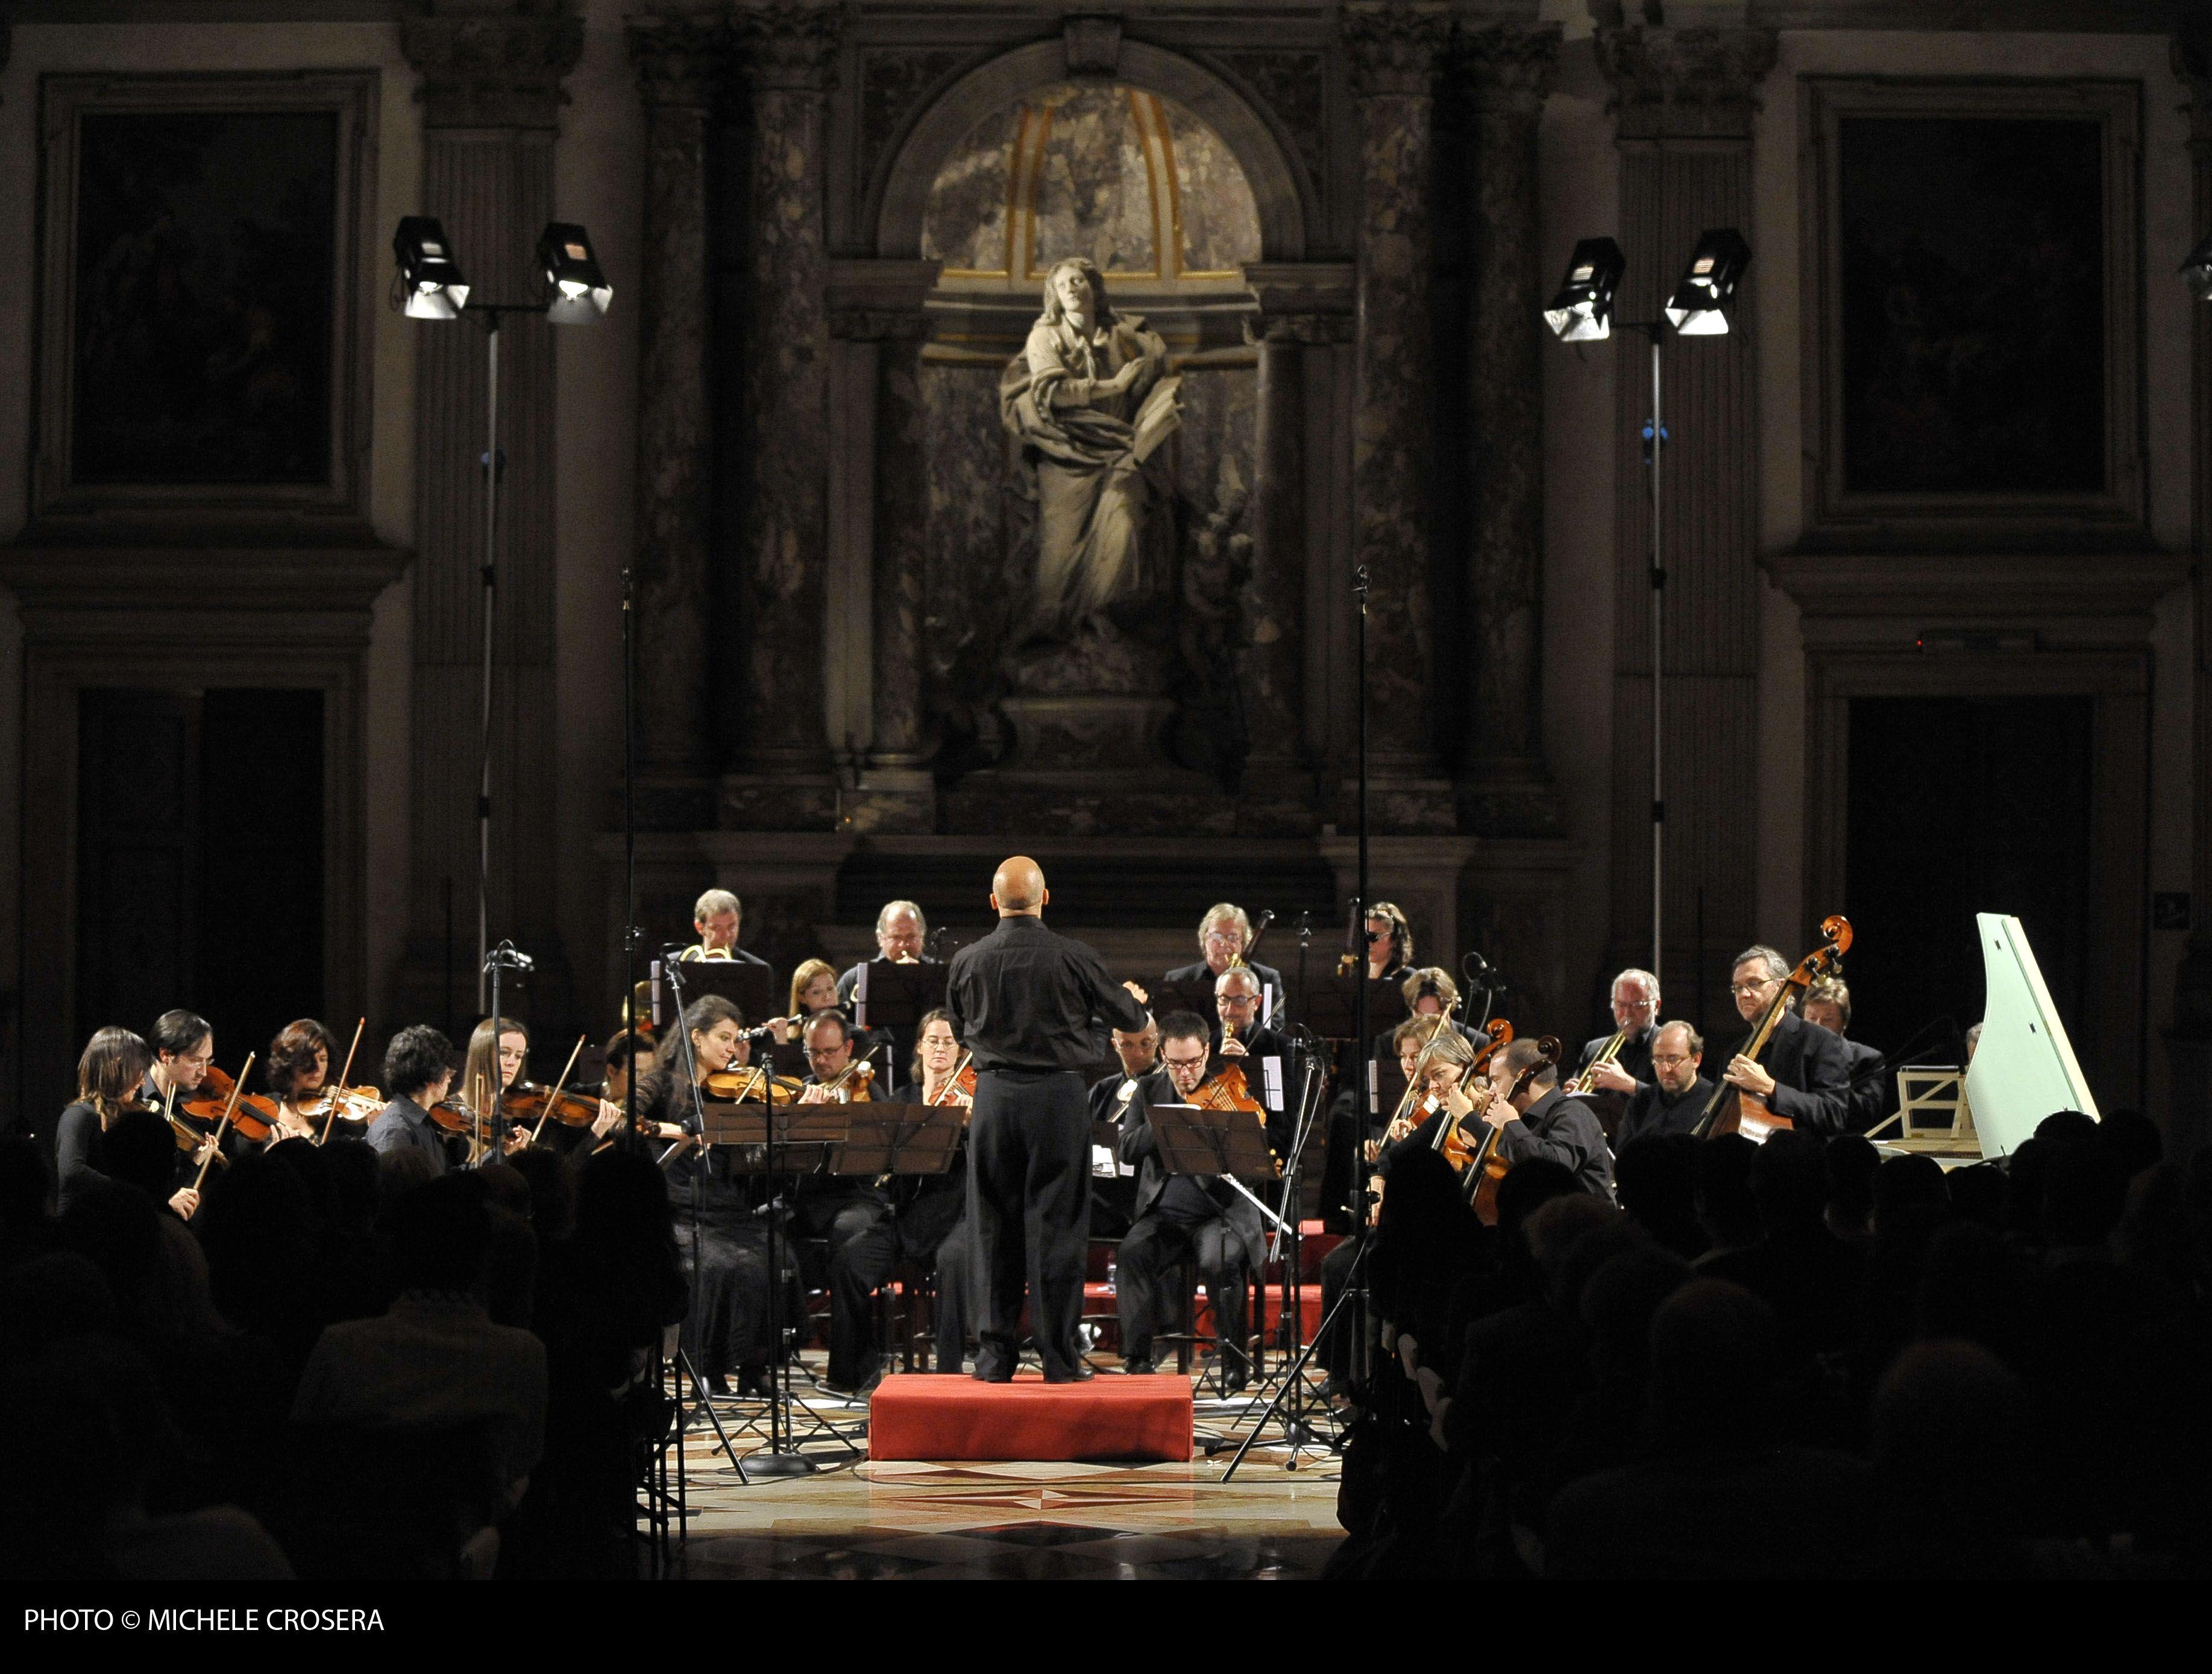 Auser Musici in Venezia 1